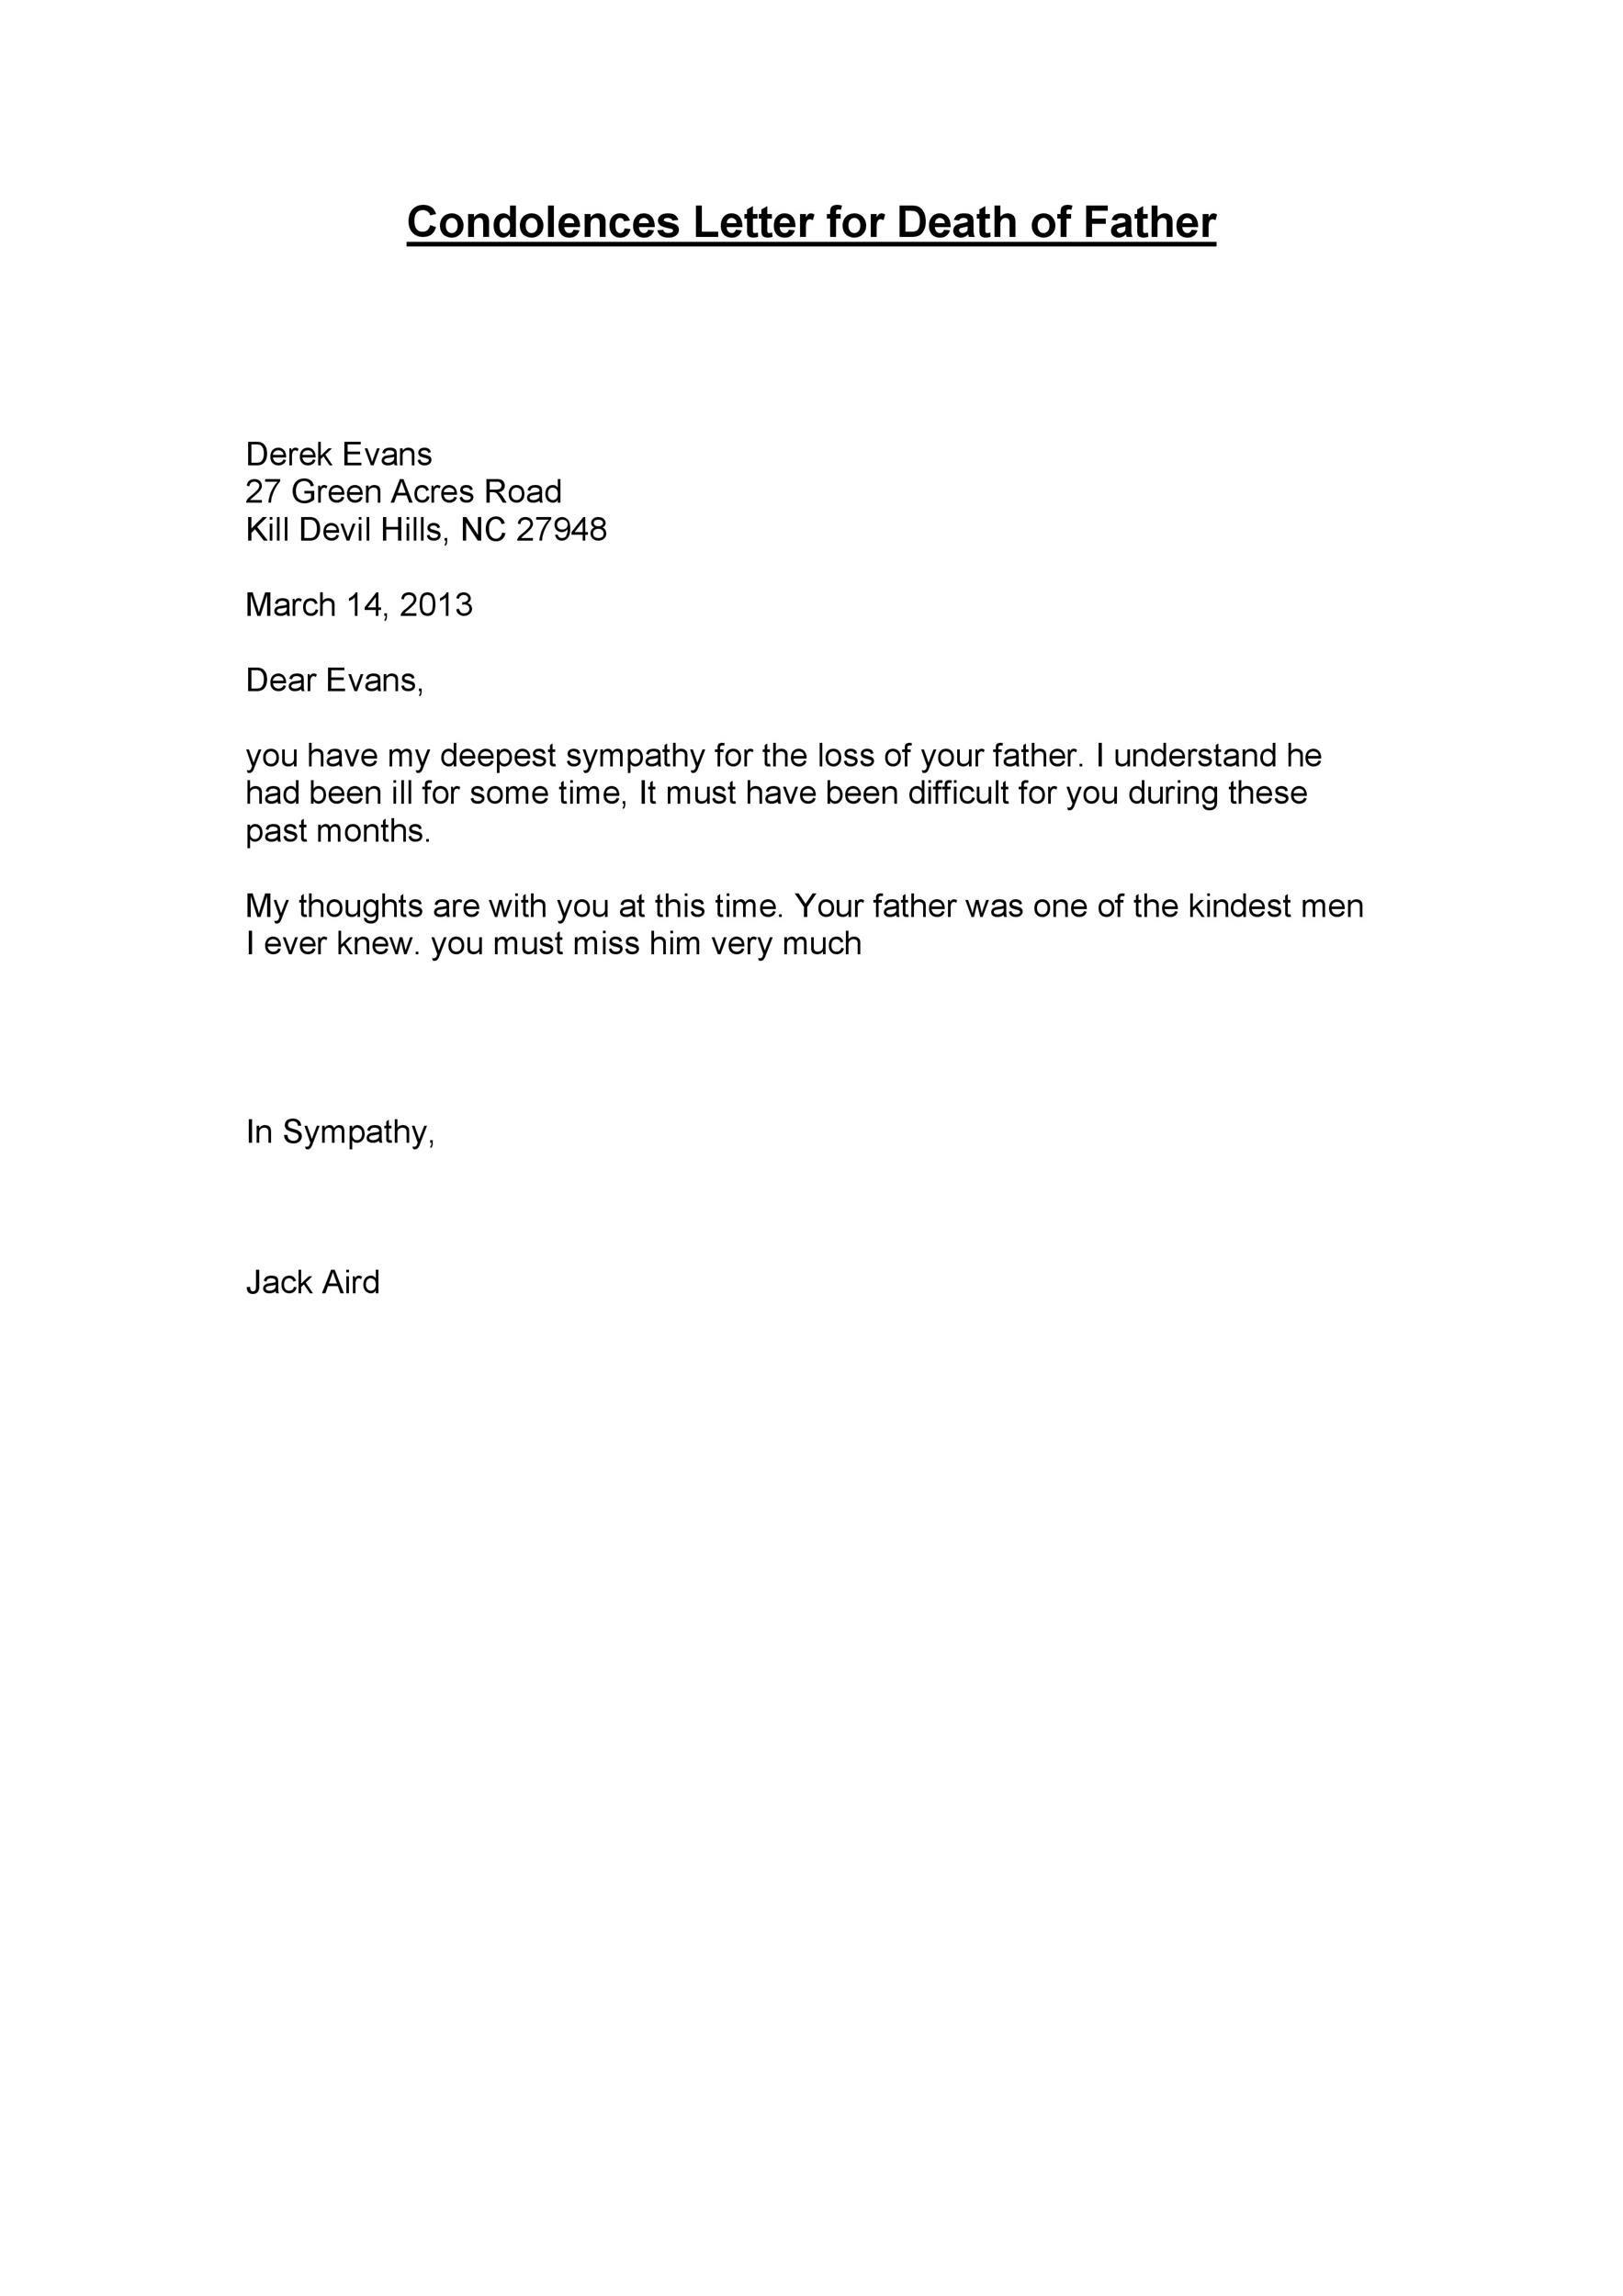 41 Condolence & Sympathy Letter Samples ᐅ TemplateLab